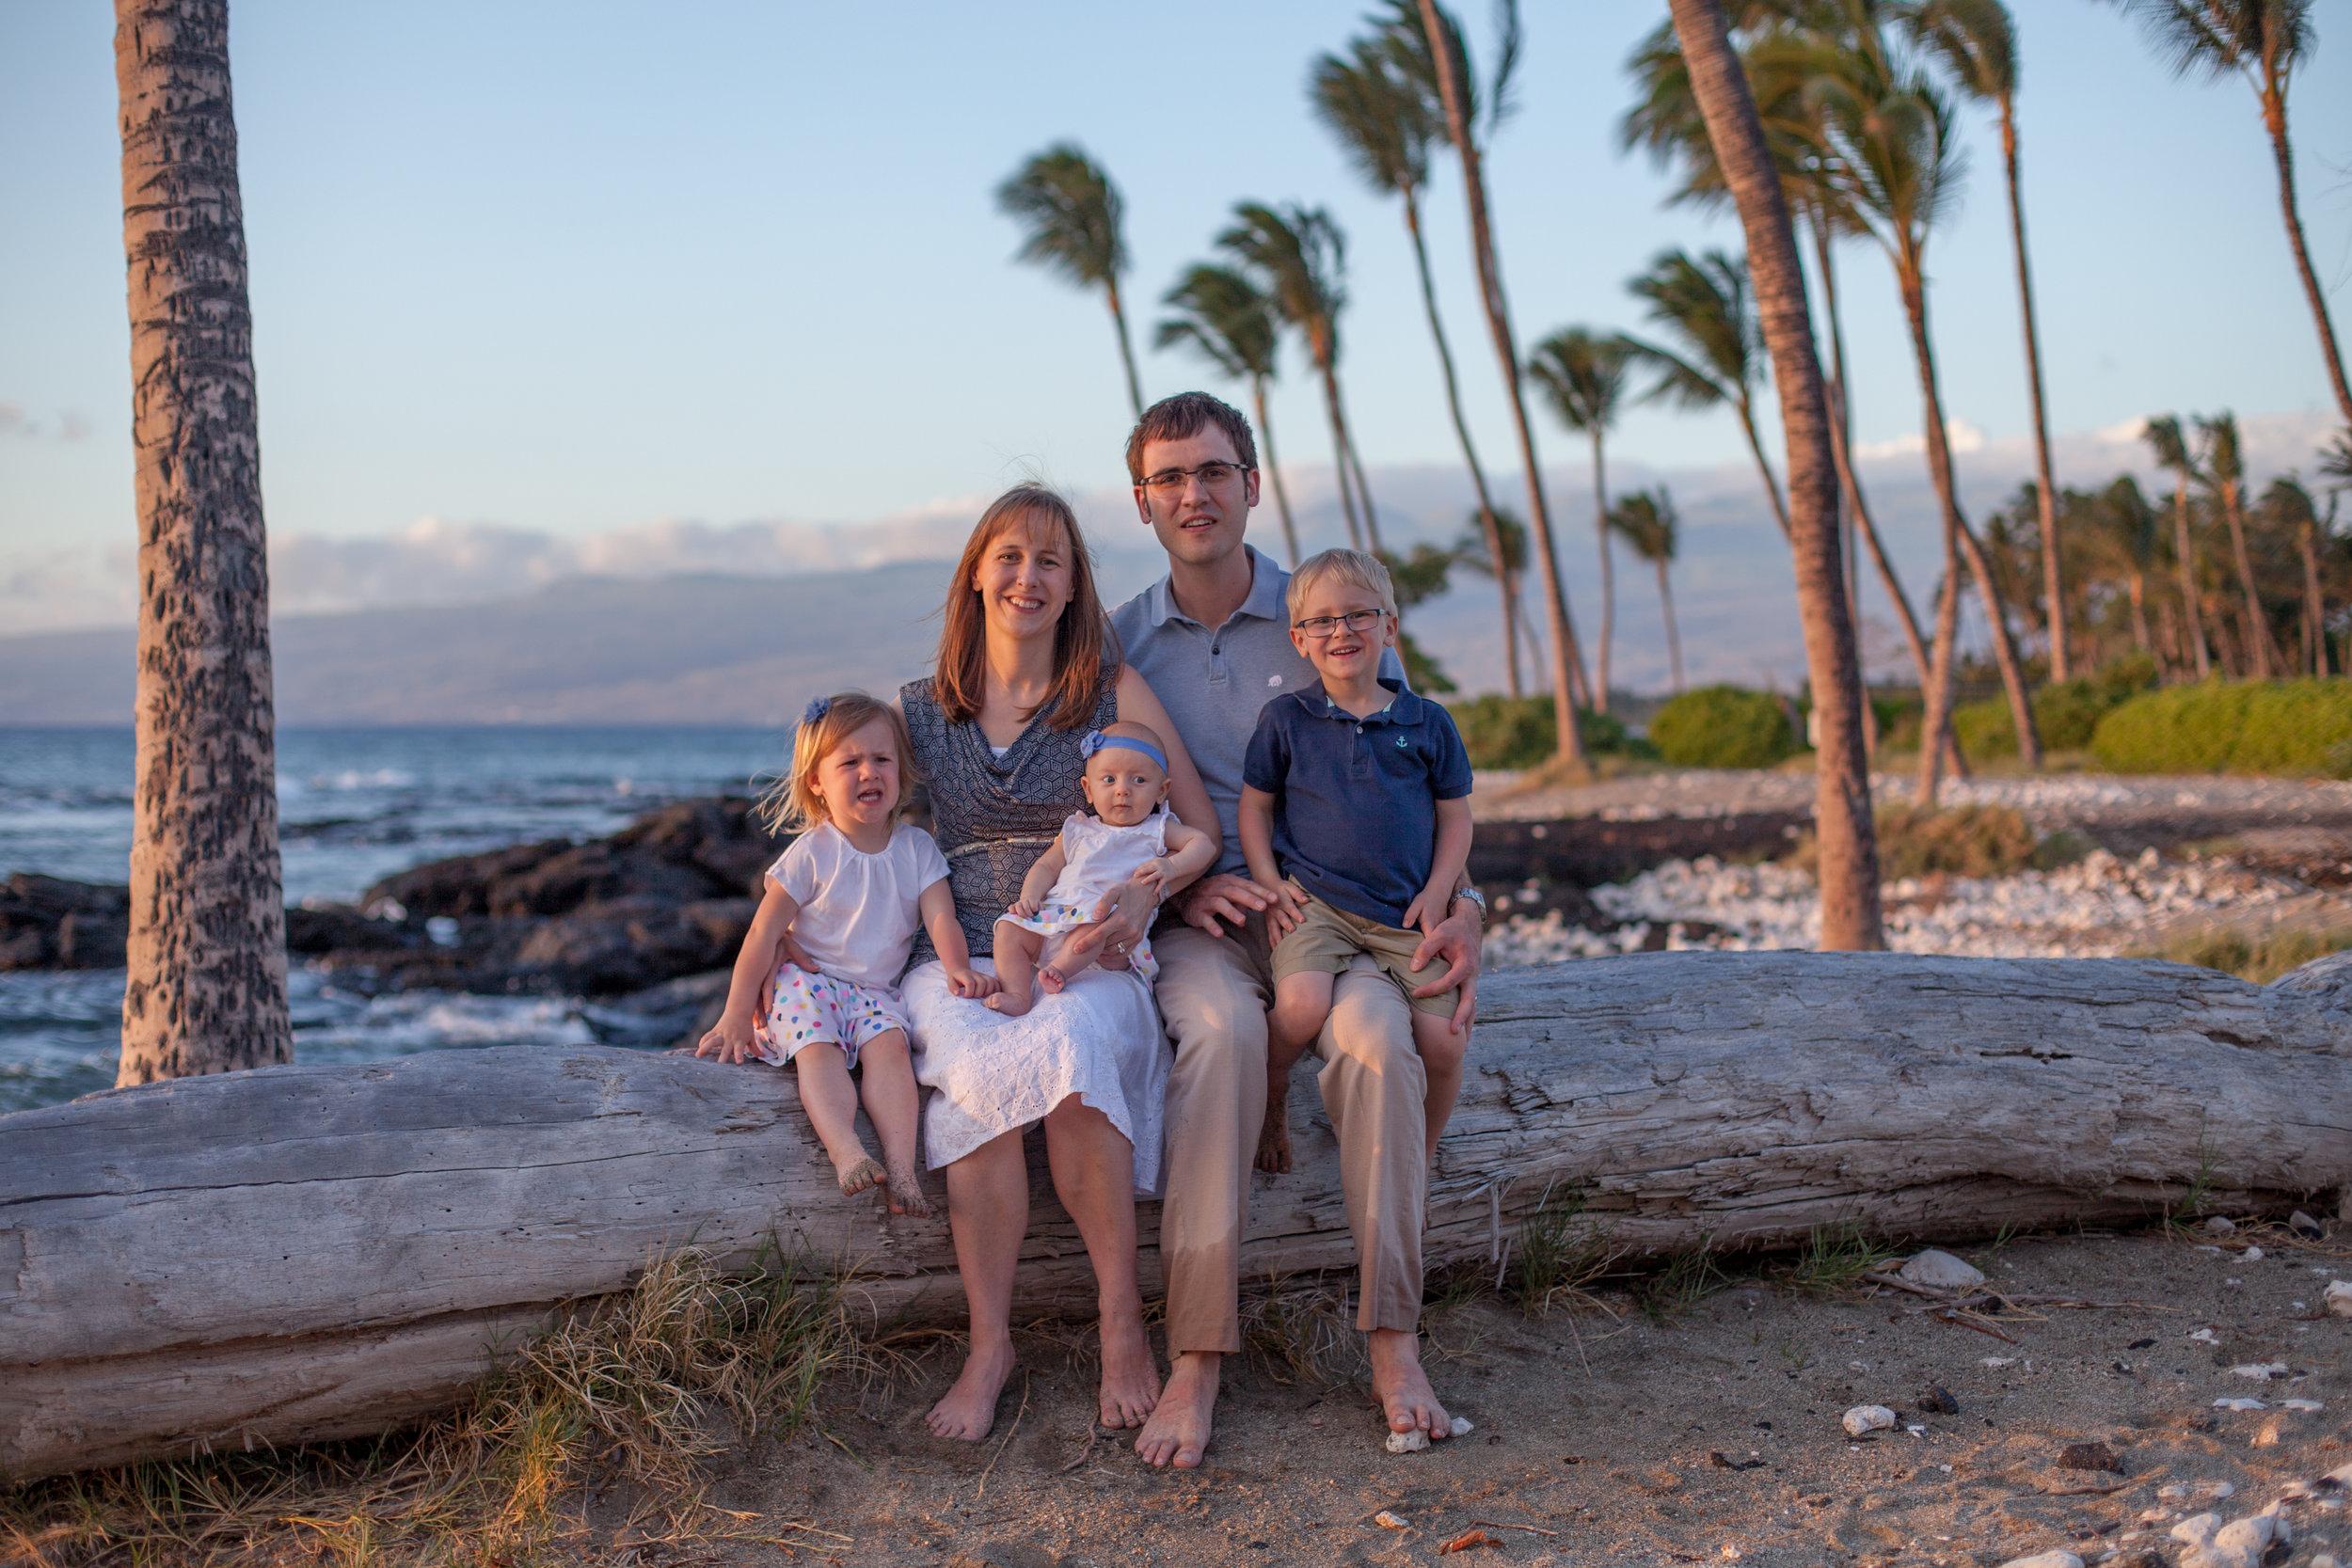 big island hawaii mauna lani beach family © kelilina photography 20170511183345.jpg